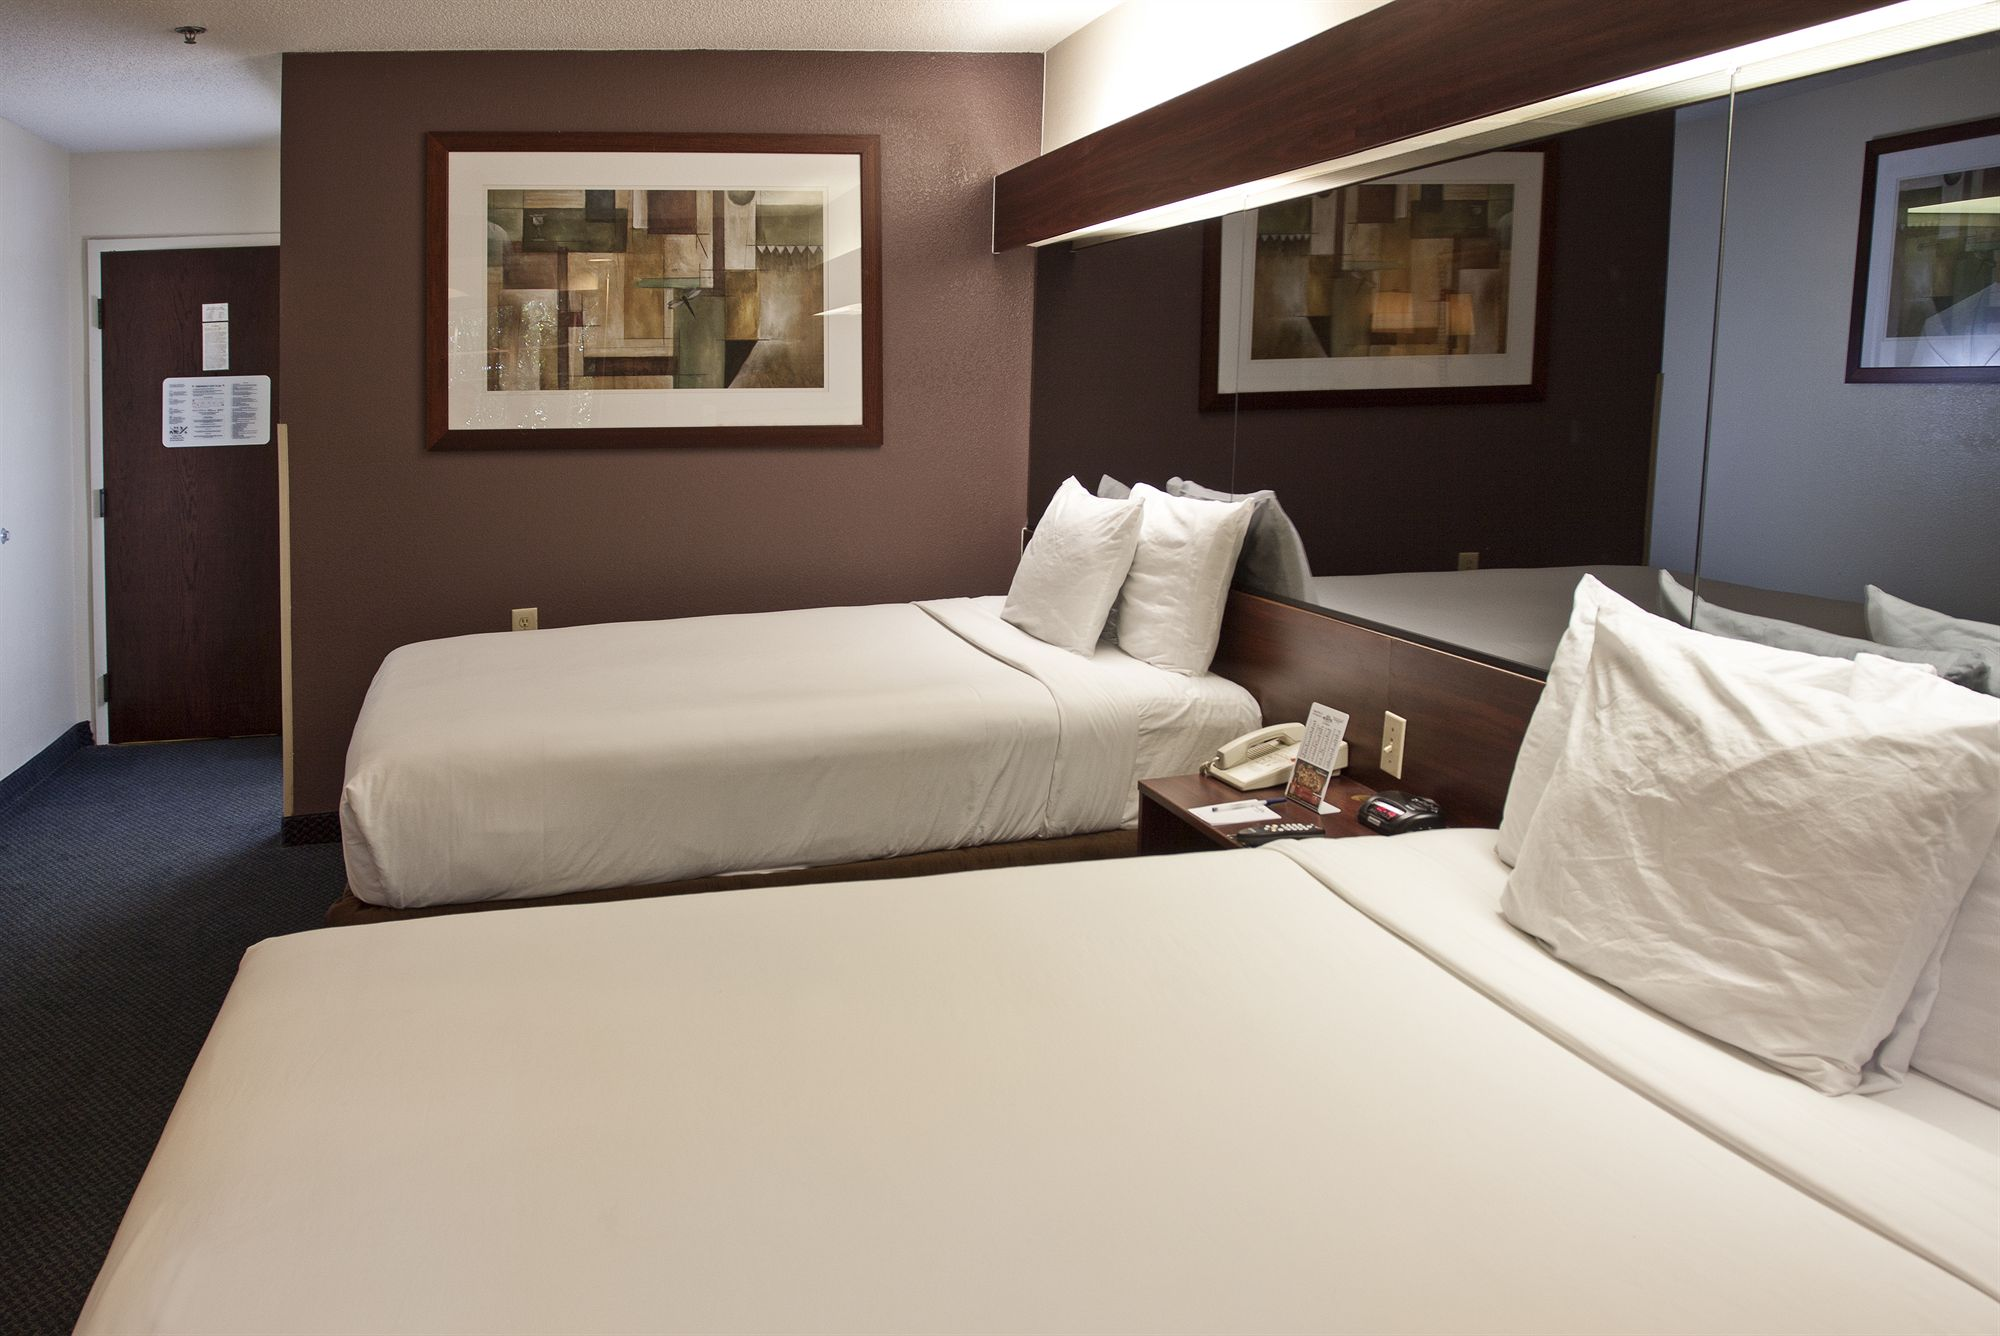 Microtel Inn by Wyndham Atlanta Airport in College Park, GA